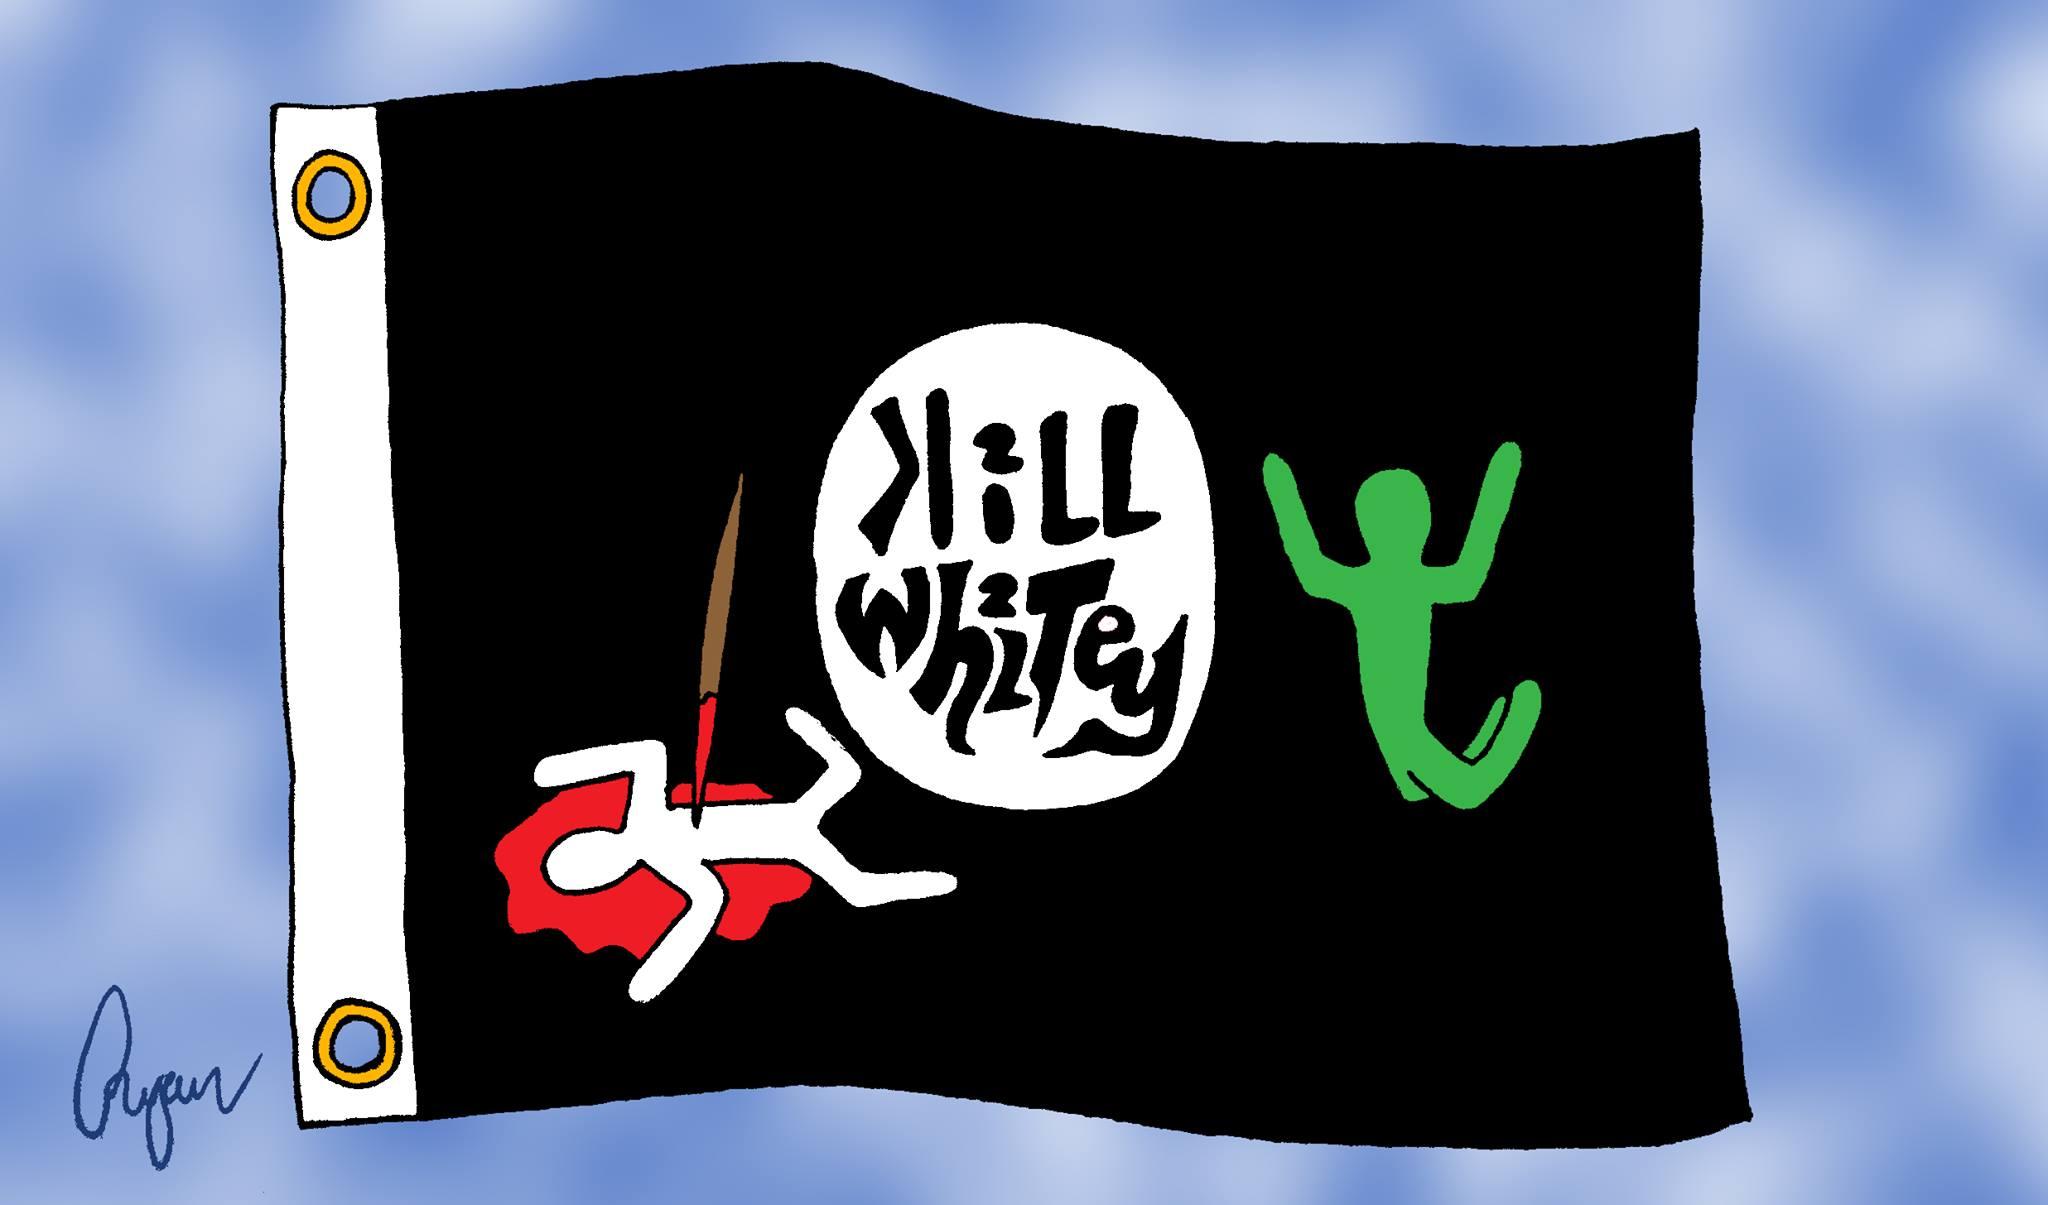 Flag by Ryan Fletcher.